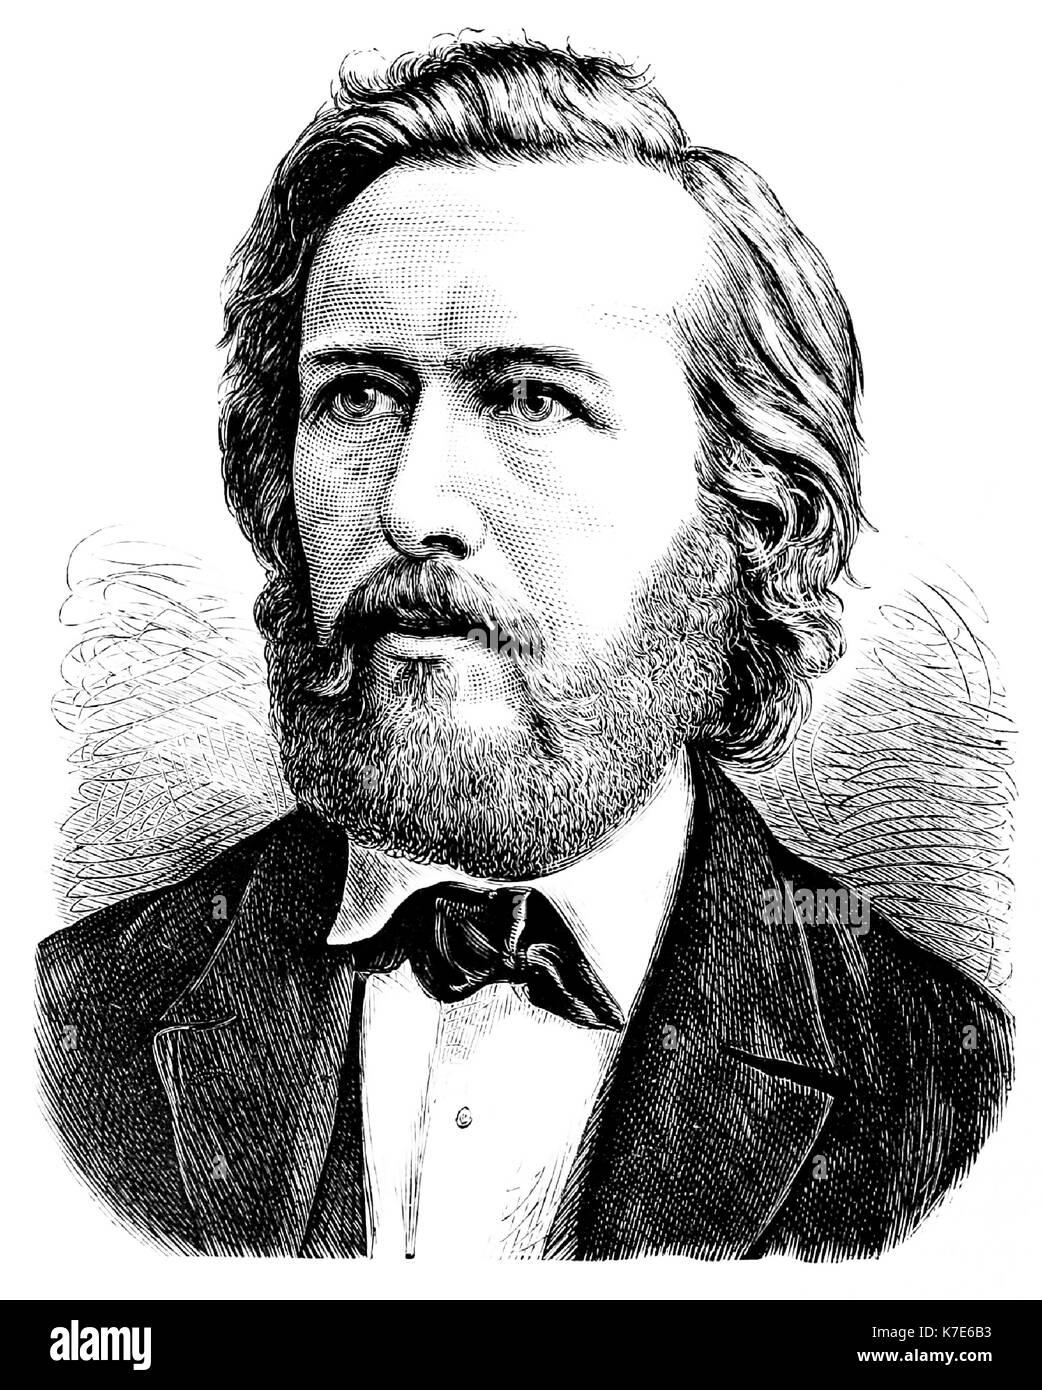 Ernst haeckel (1834-1919) biologo tedesco nel 1860 Immagini Stock